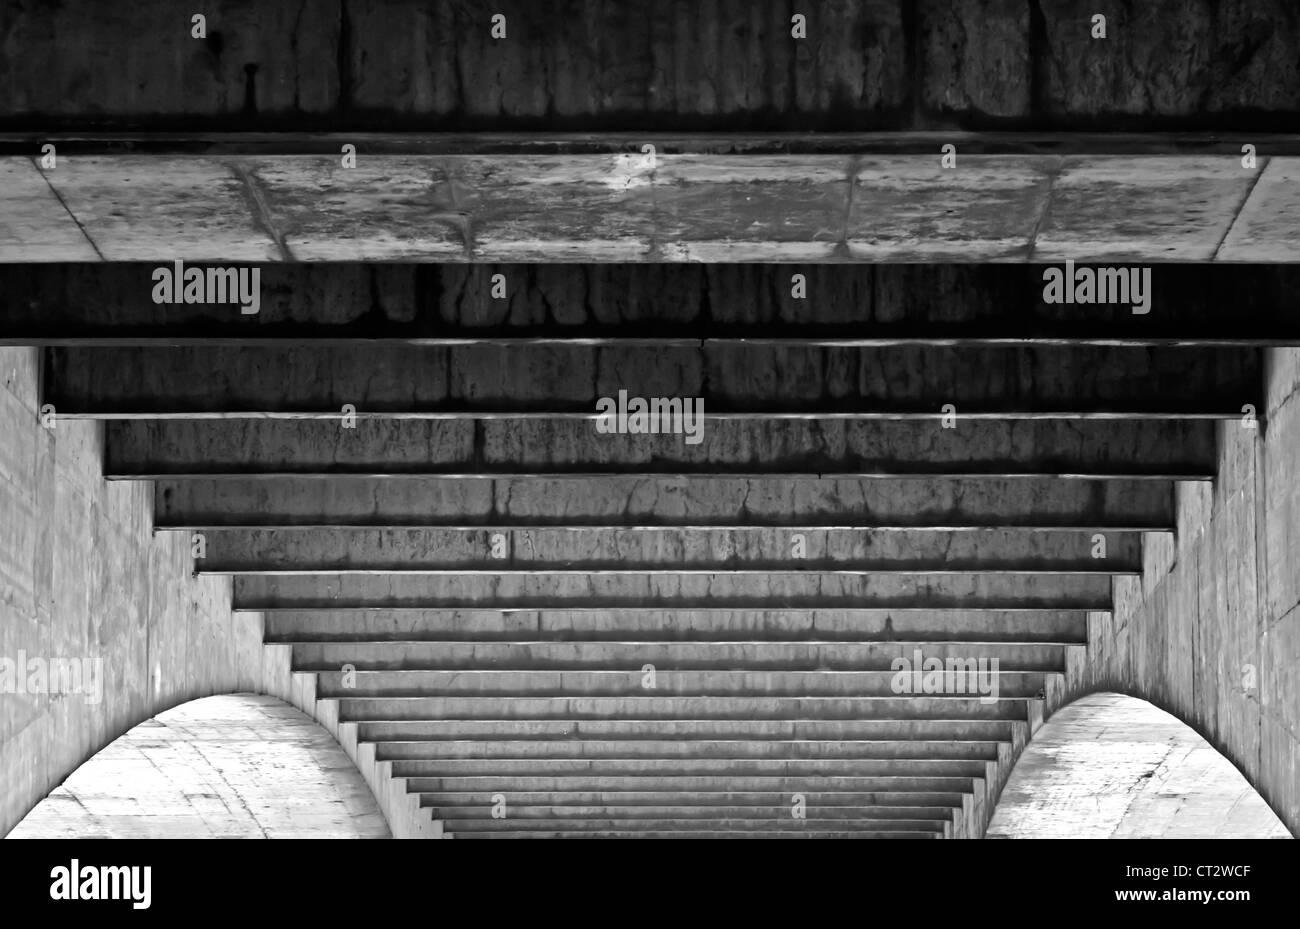 Underside of Waterloo Bridge - Stock Image